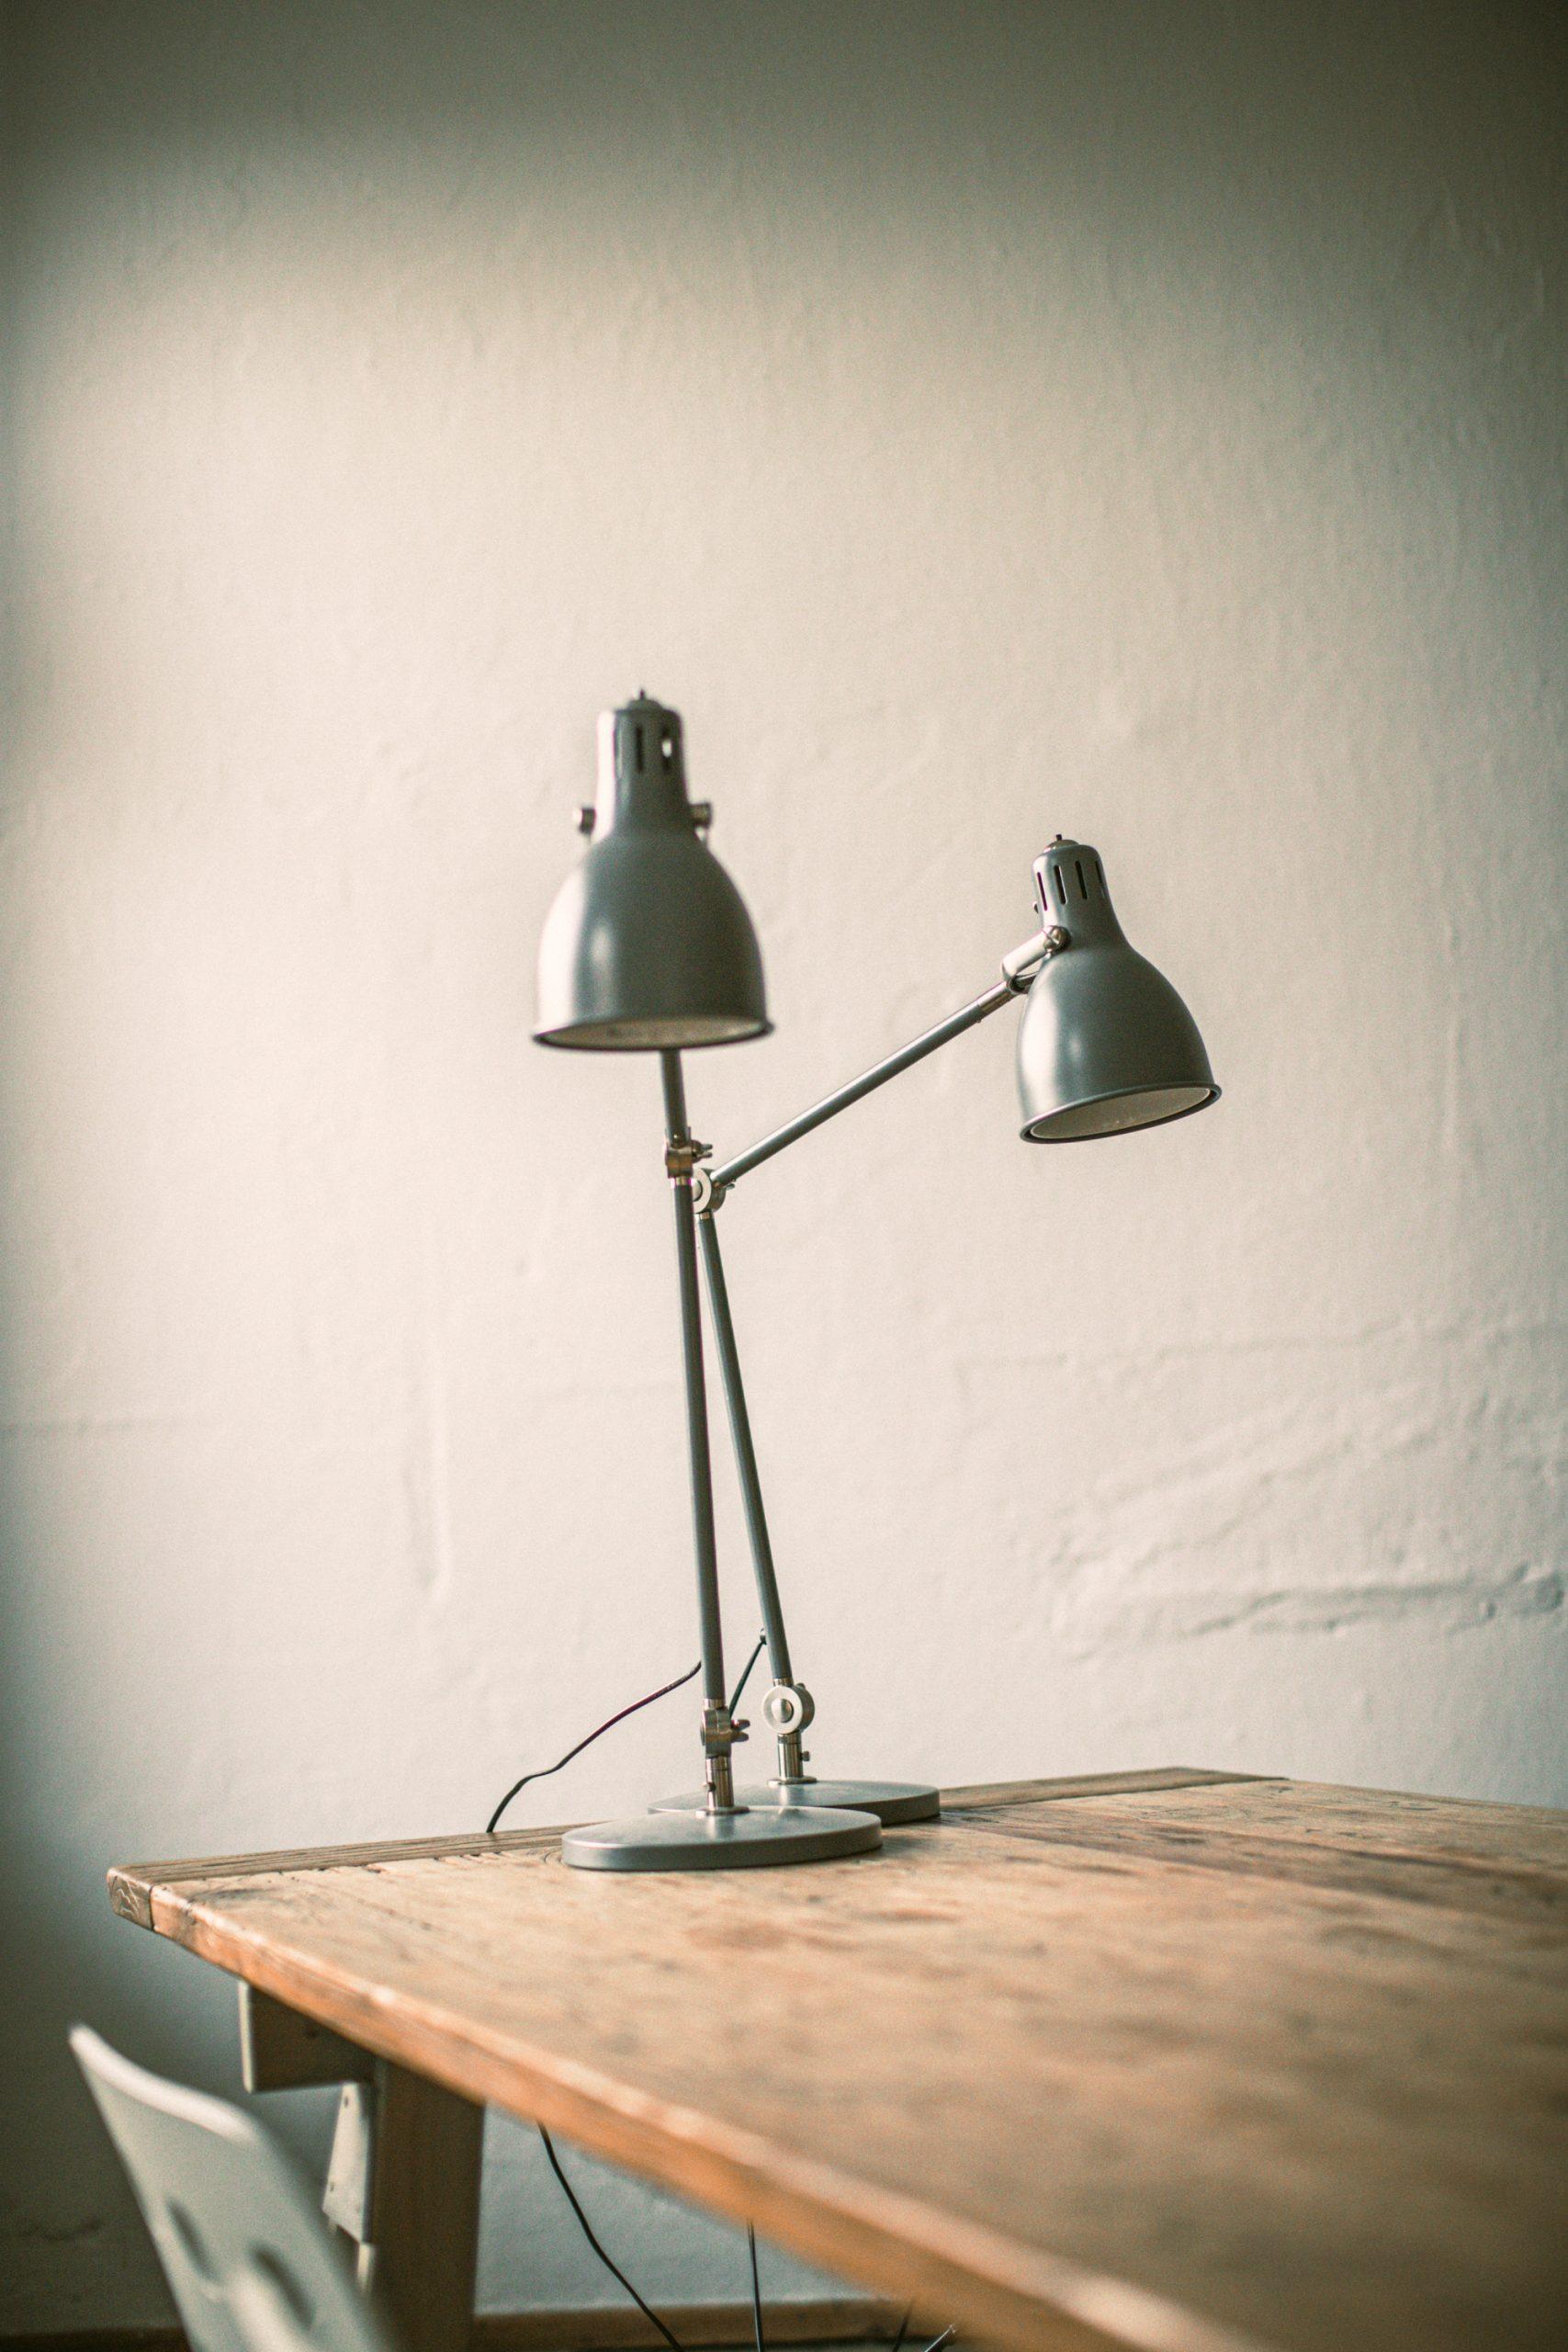 fotoproduktion-lampe-details-kme-studios